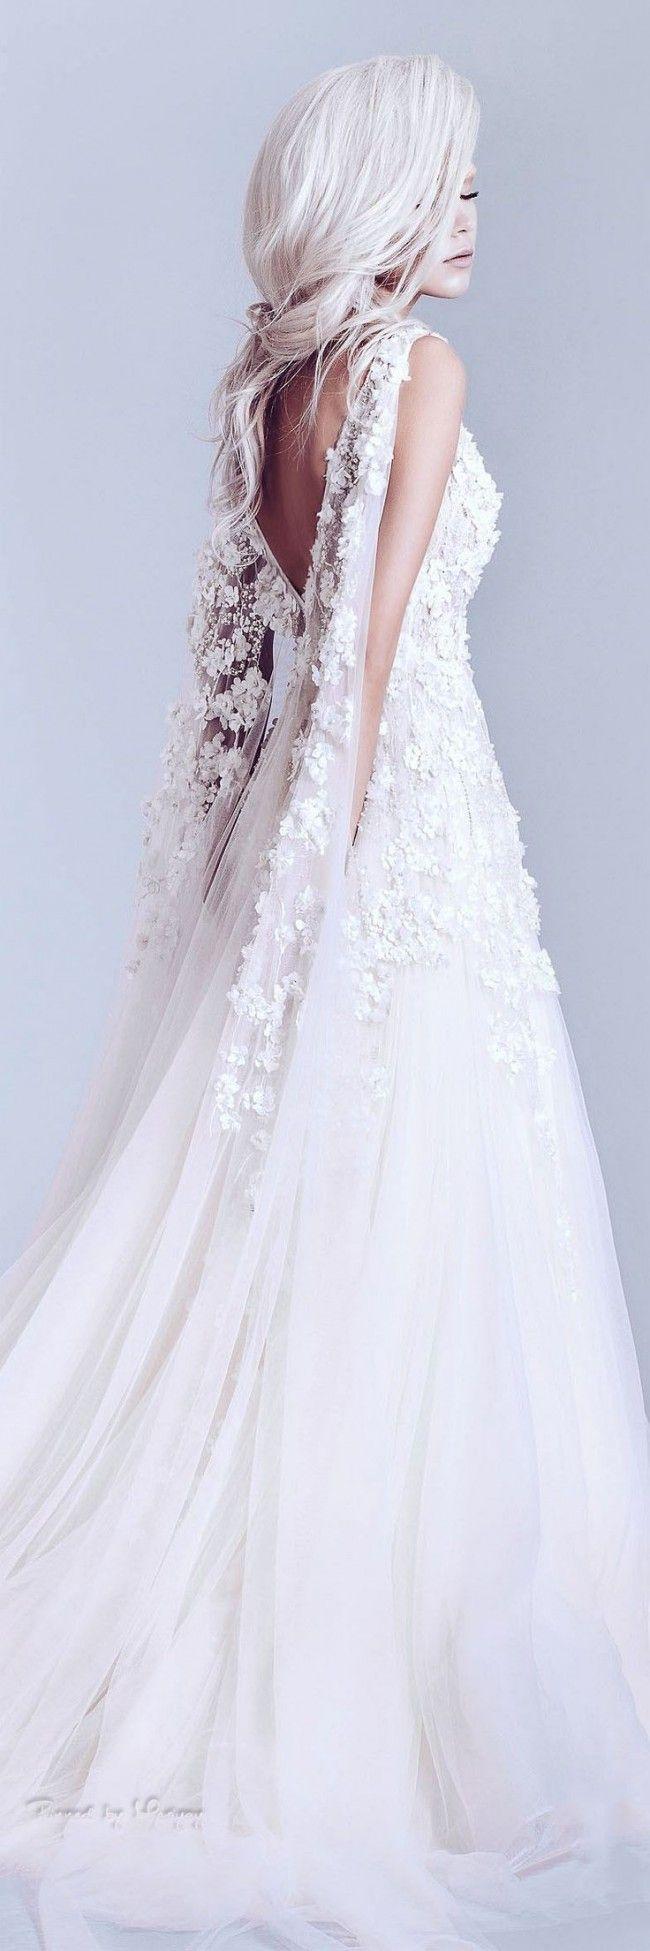 Alfazairy SS 2015 Ok so if we get married this is the dress.... #alfazairy